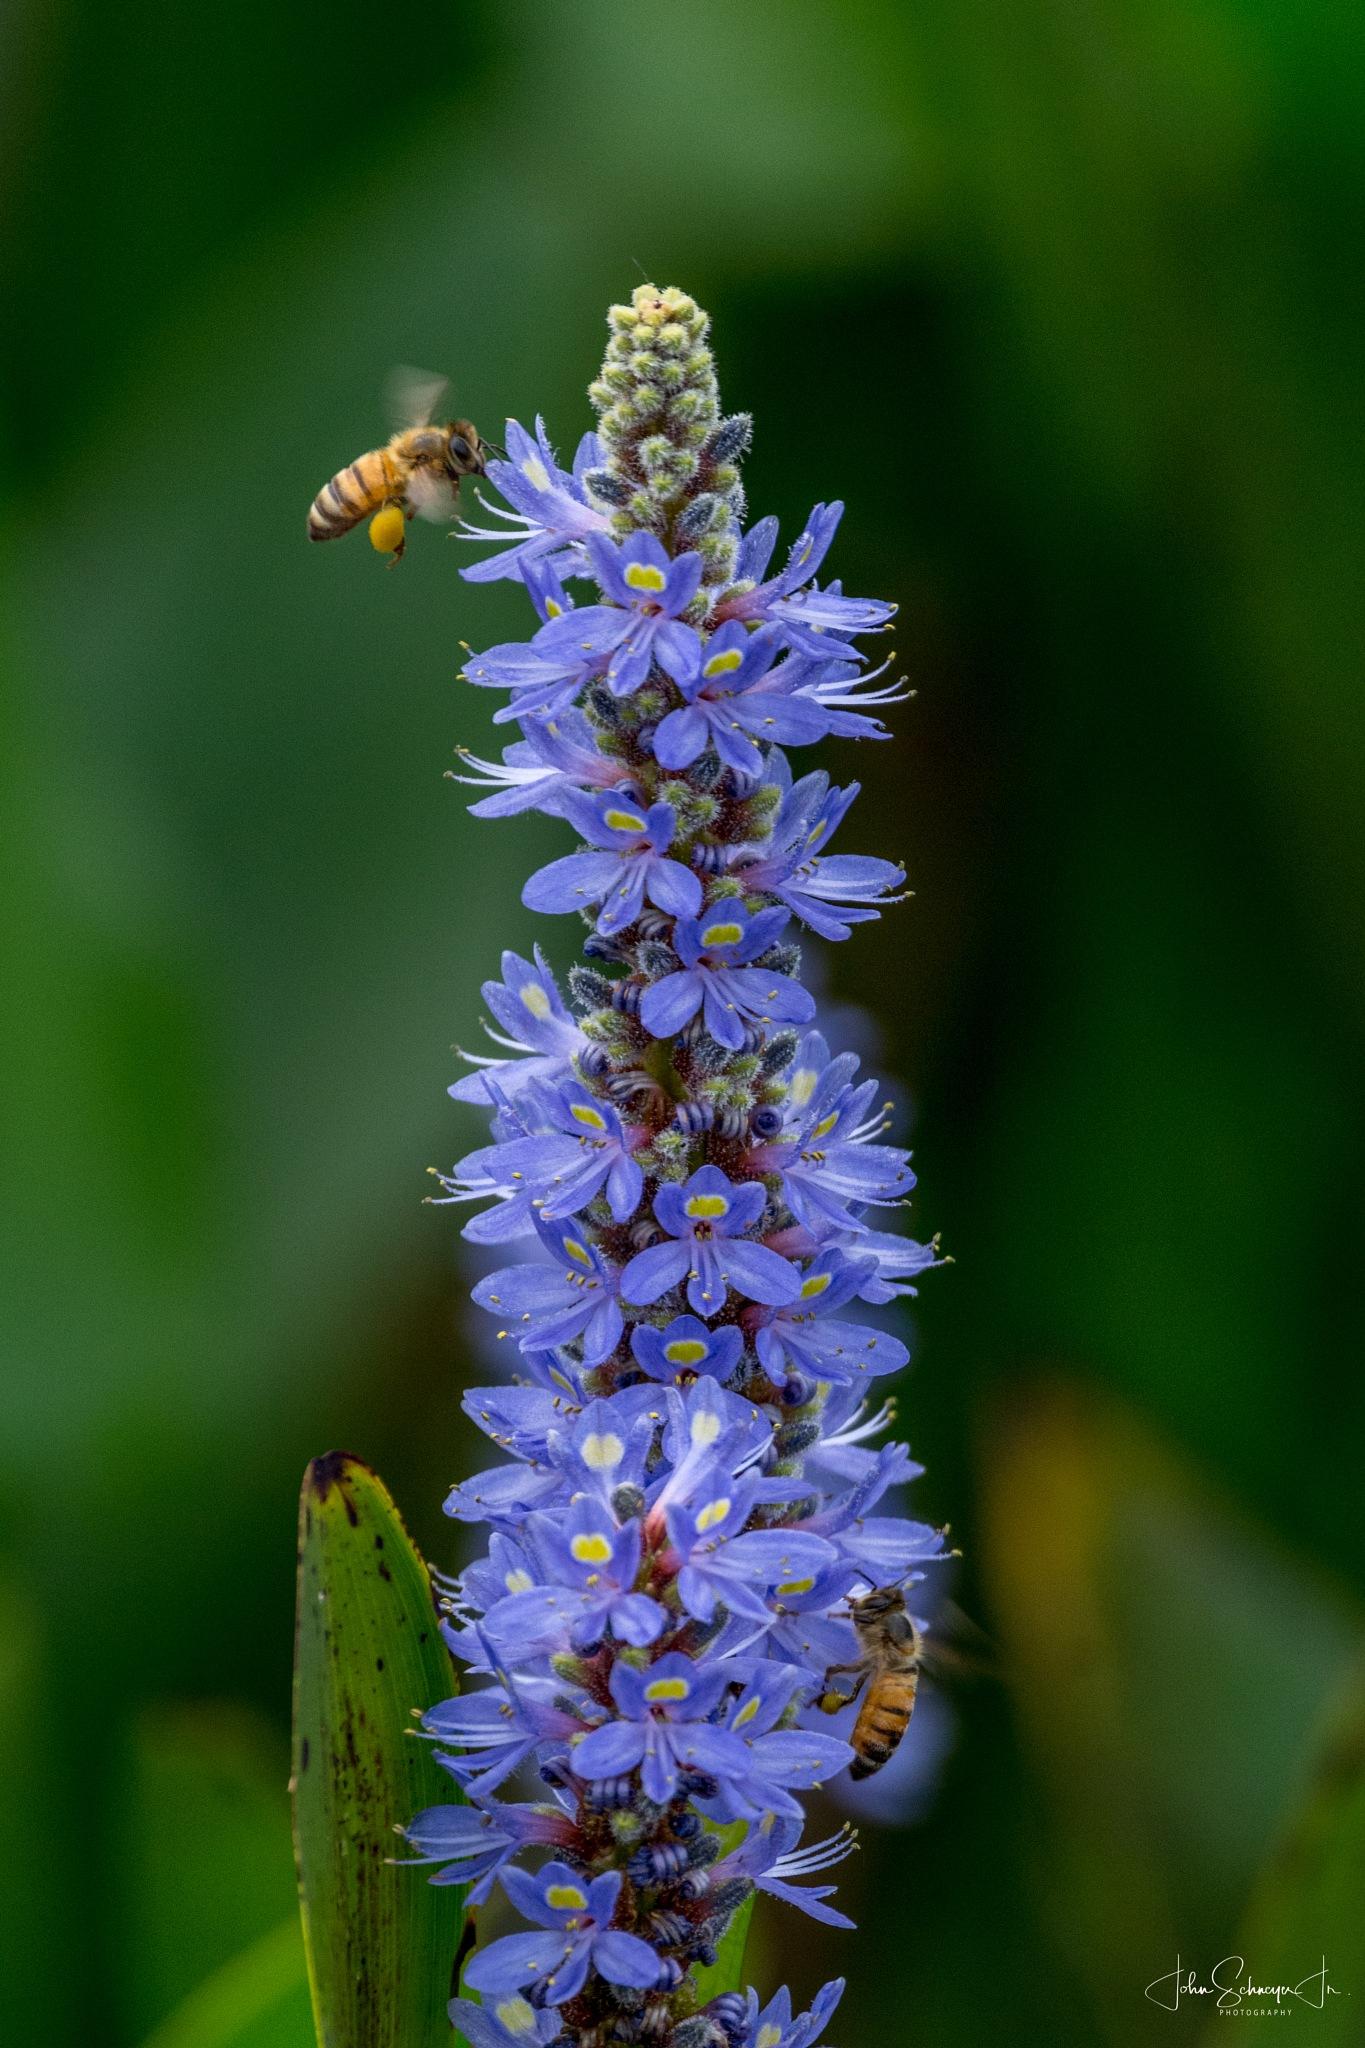 Pollination by John Schneyer